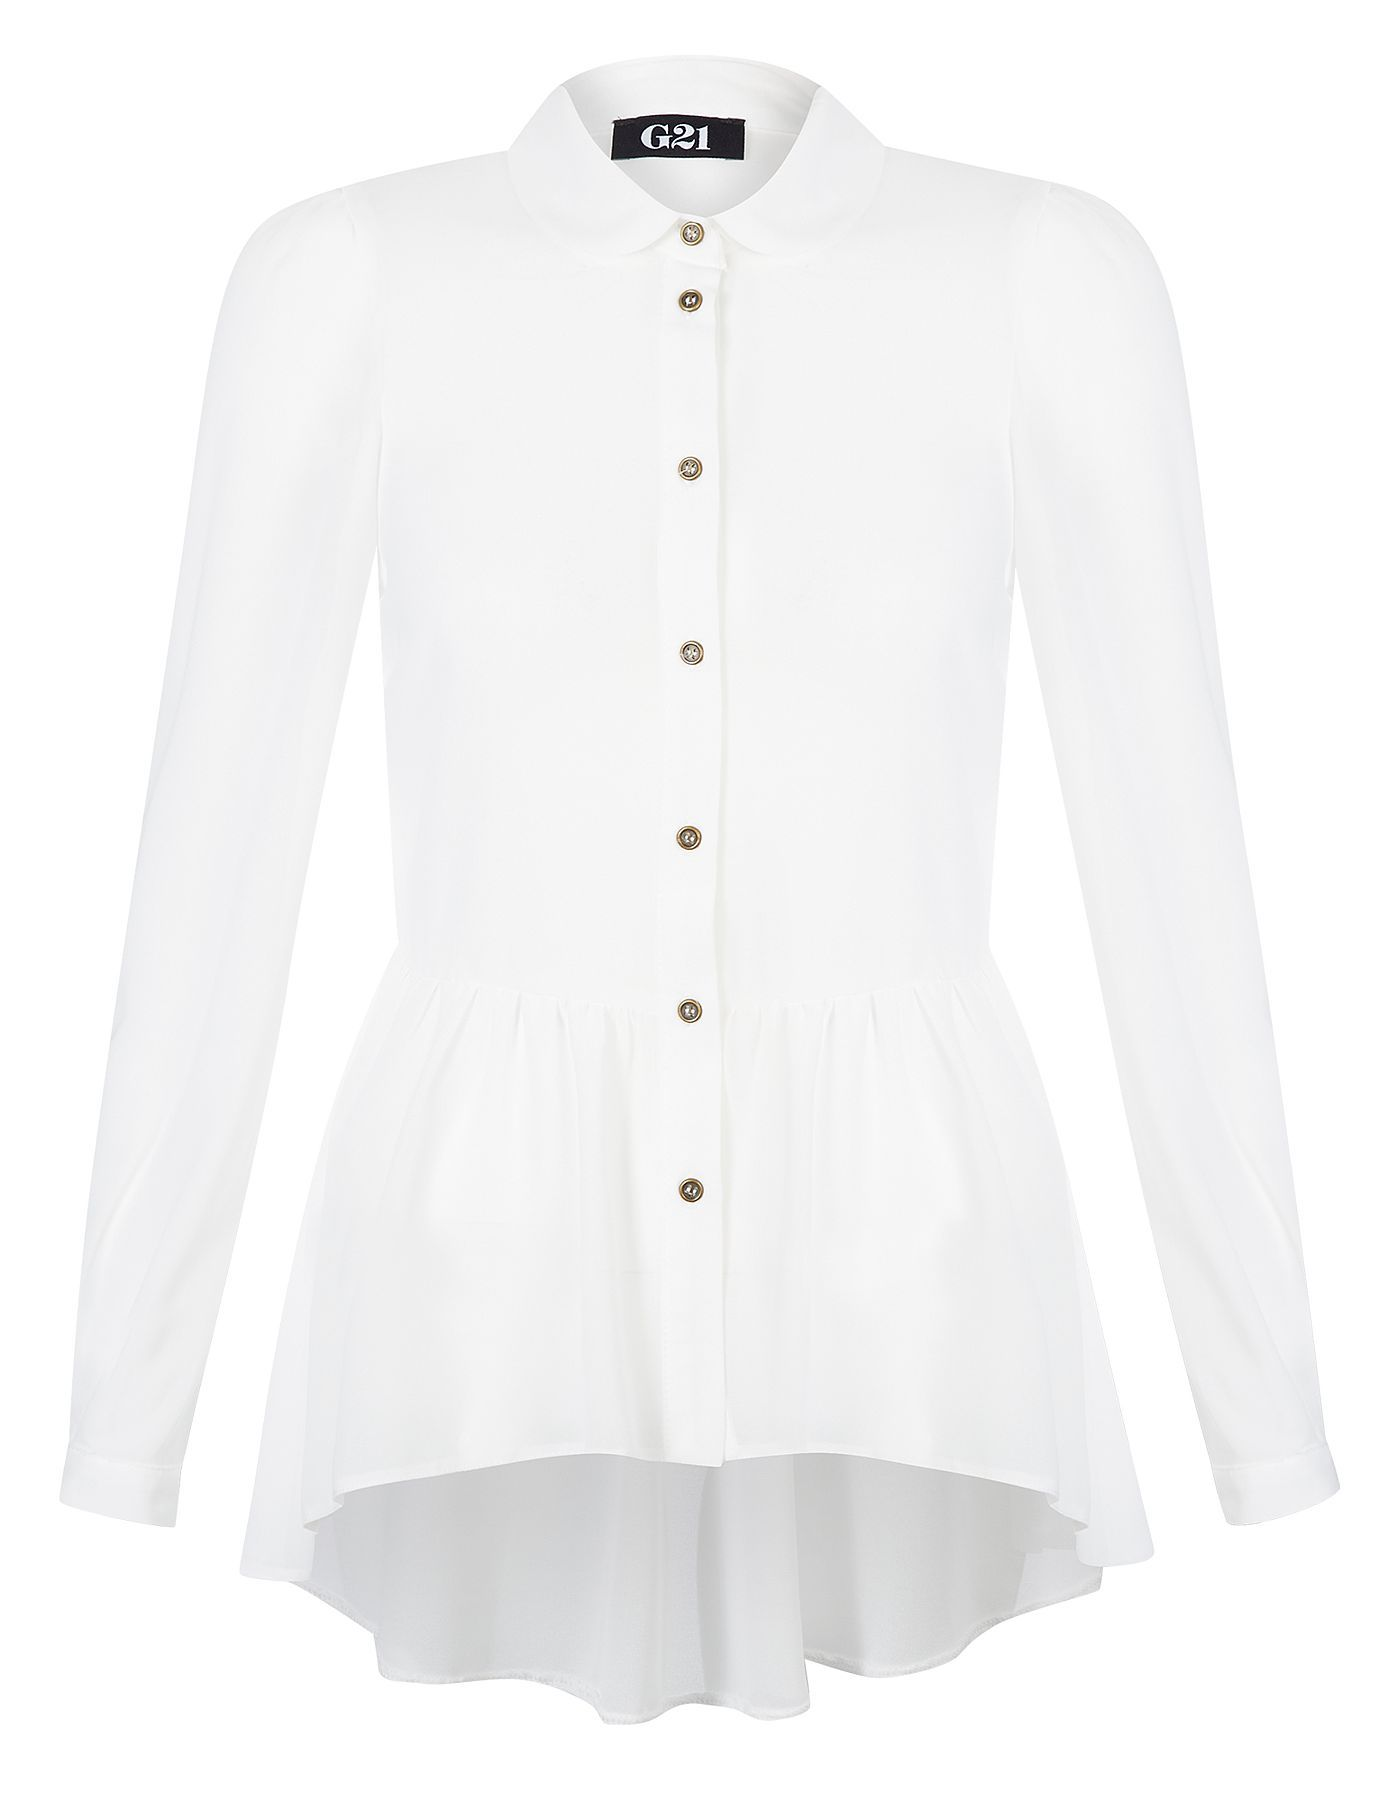 White apron asda - G21 Peplum Shirt Women George At Asda